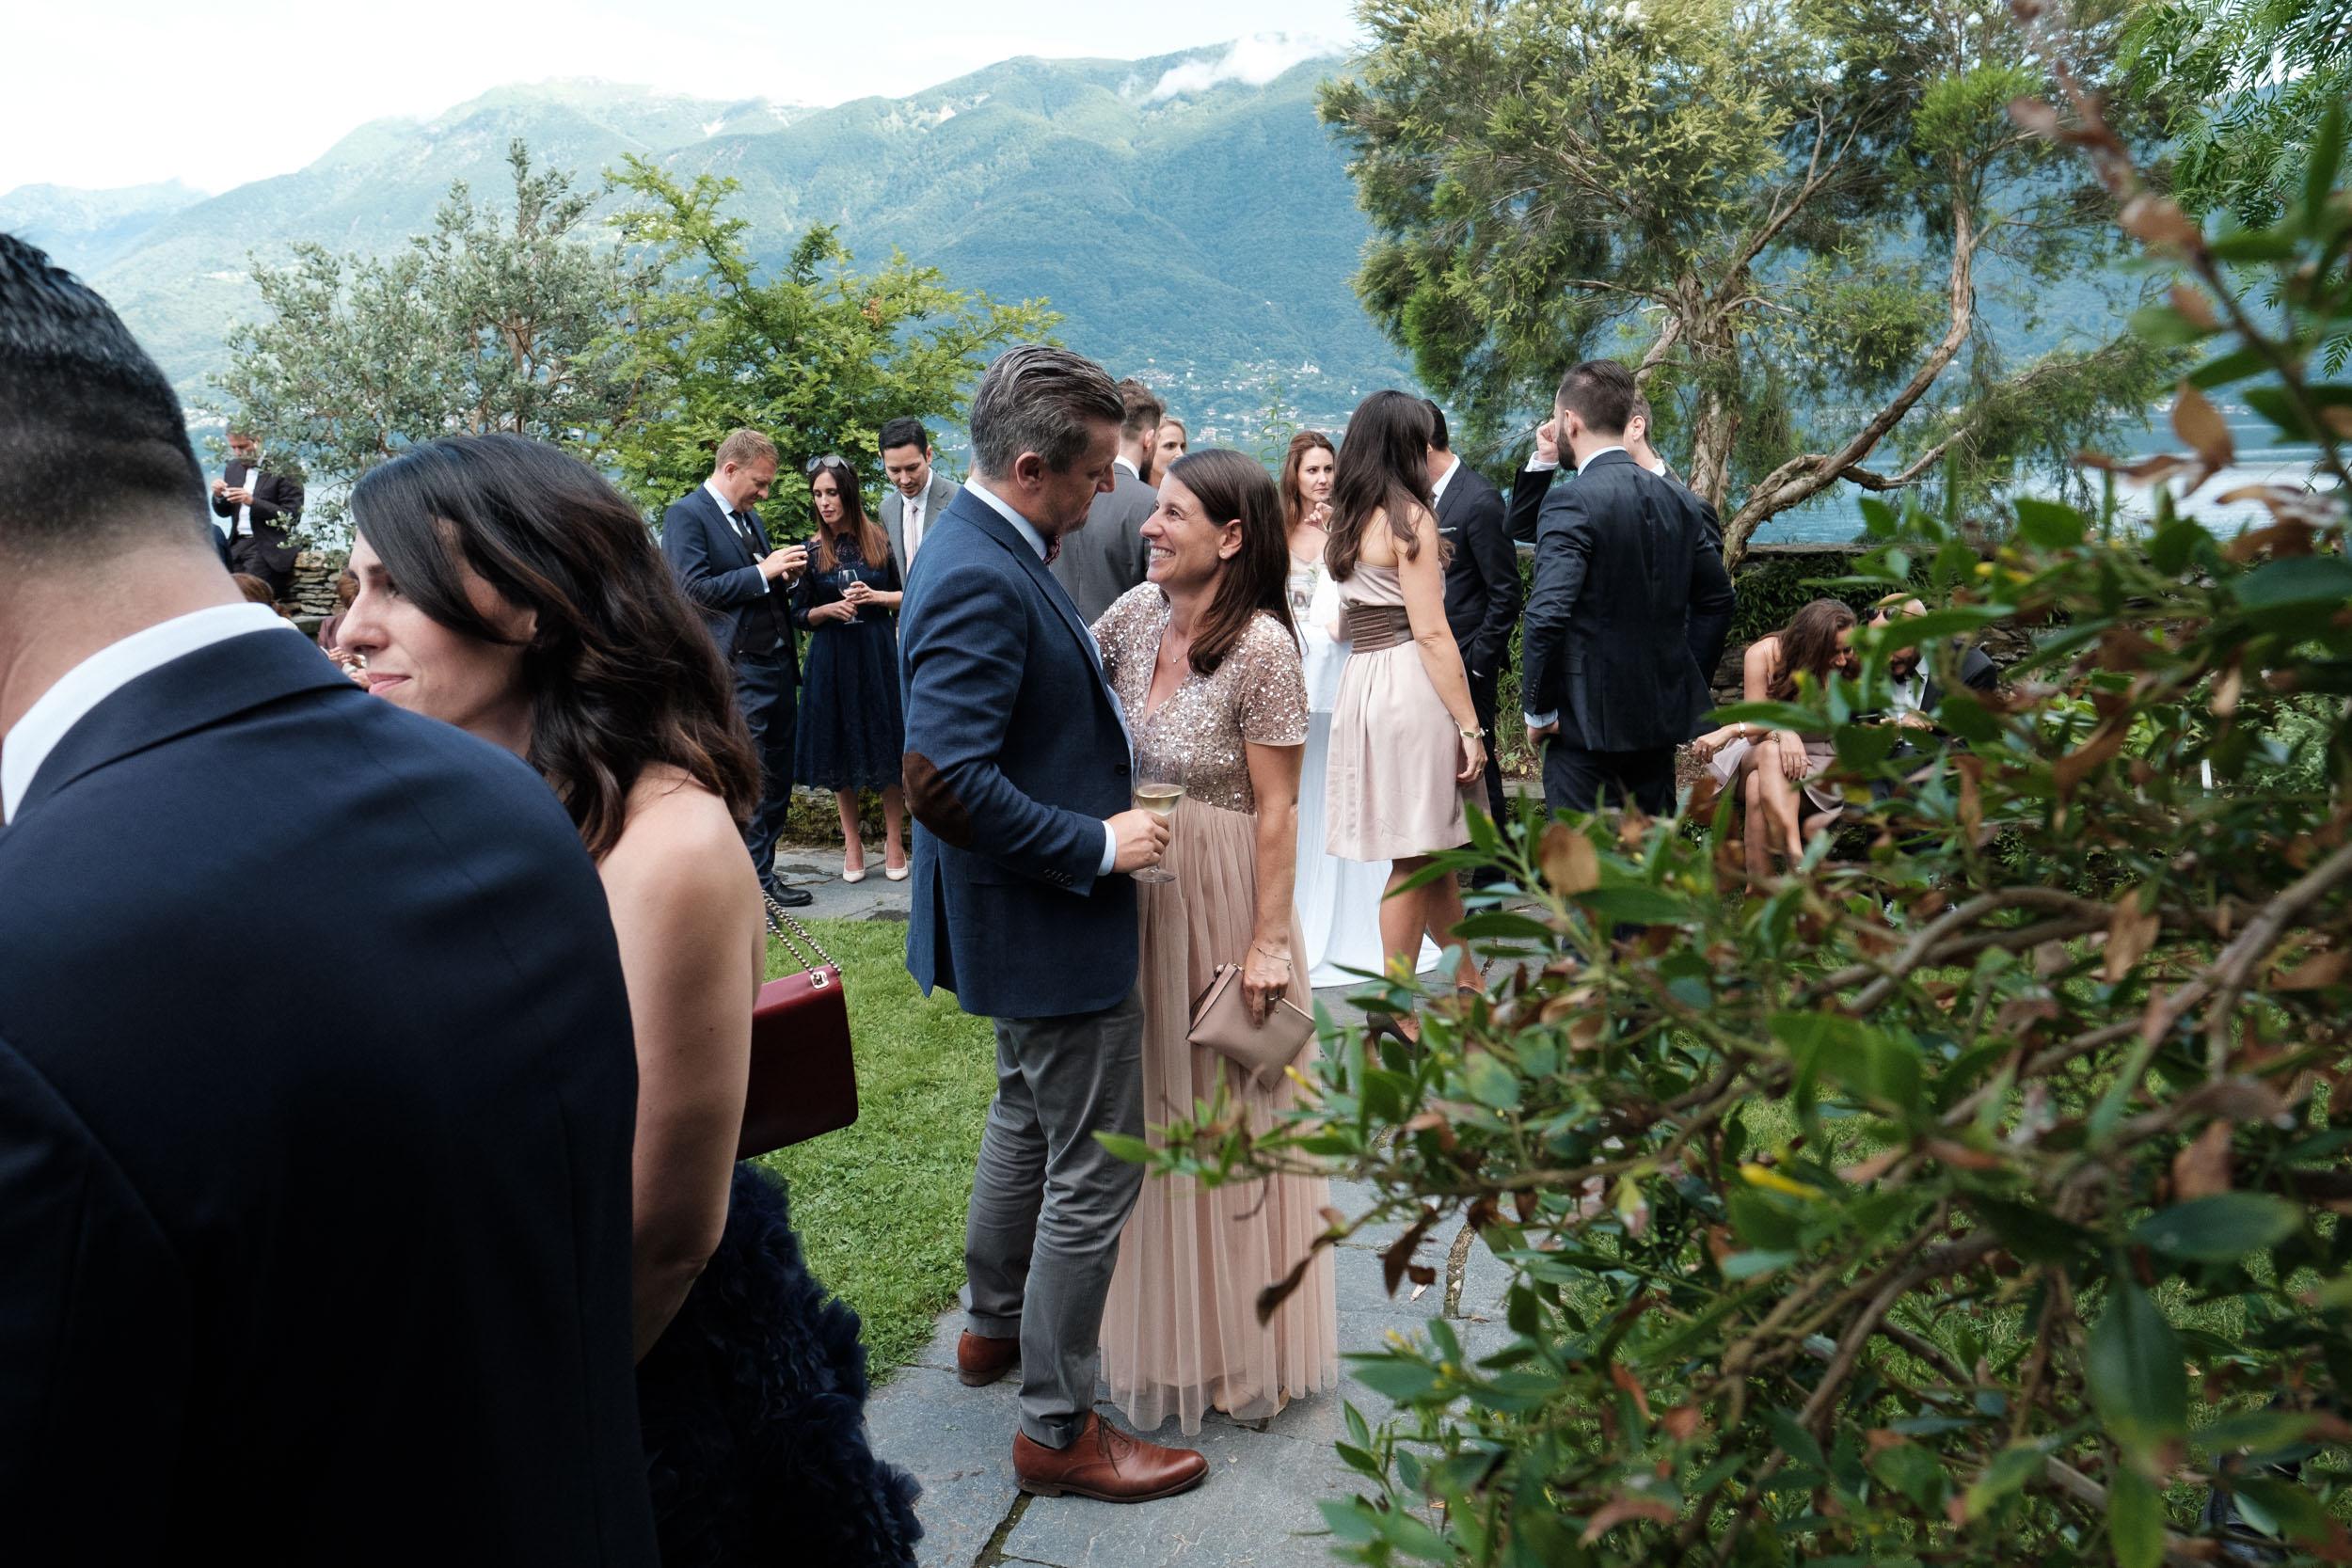 olivia-andreas-wedding-switzerland-366.jpg